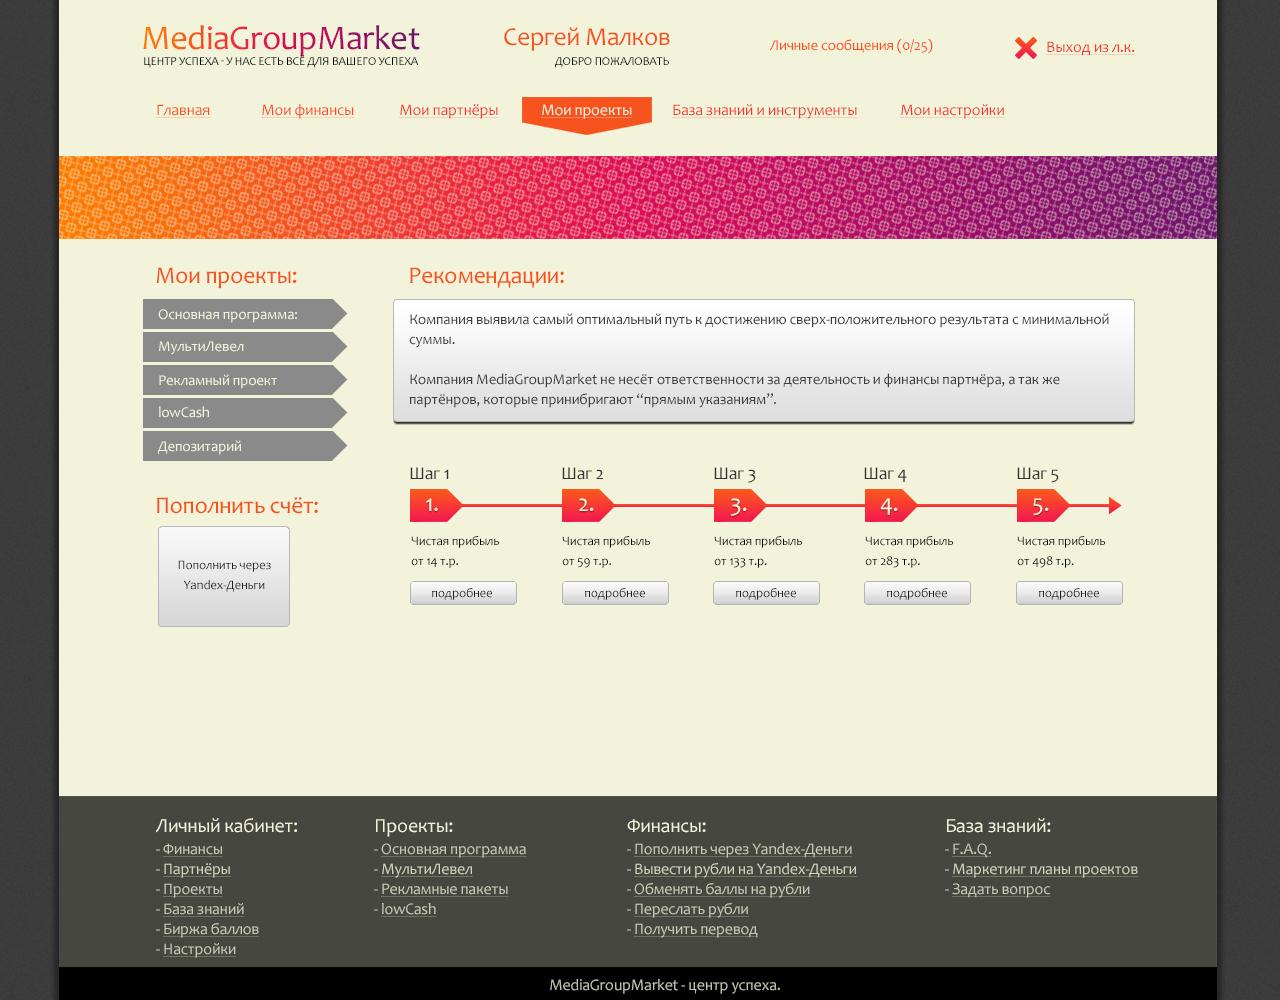 MediaGroupMarket